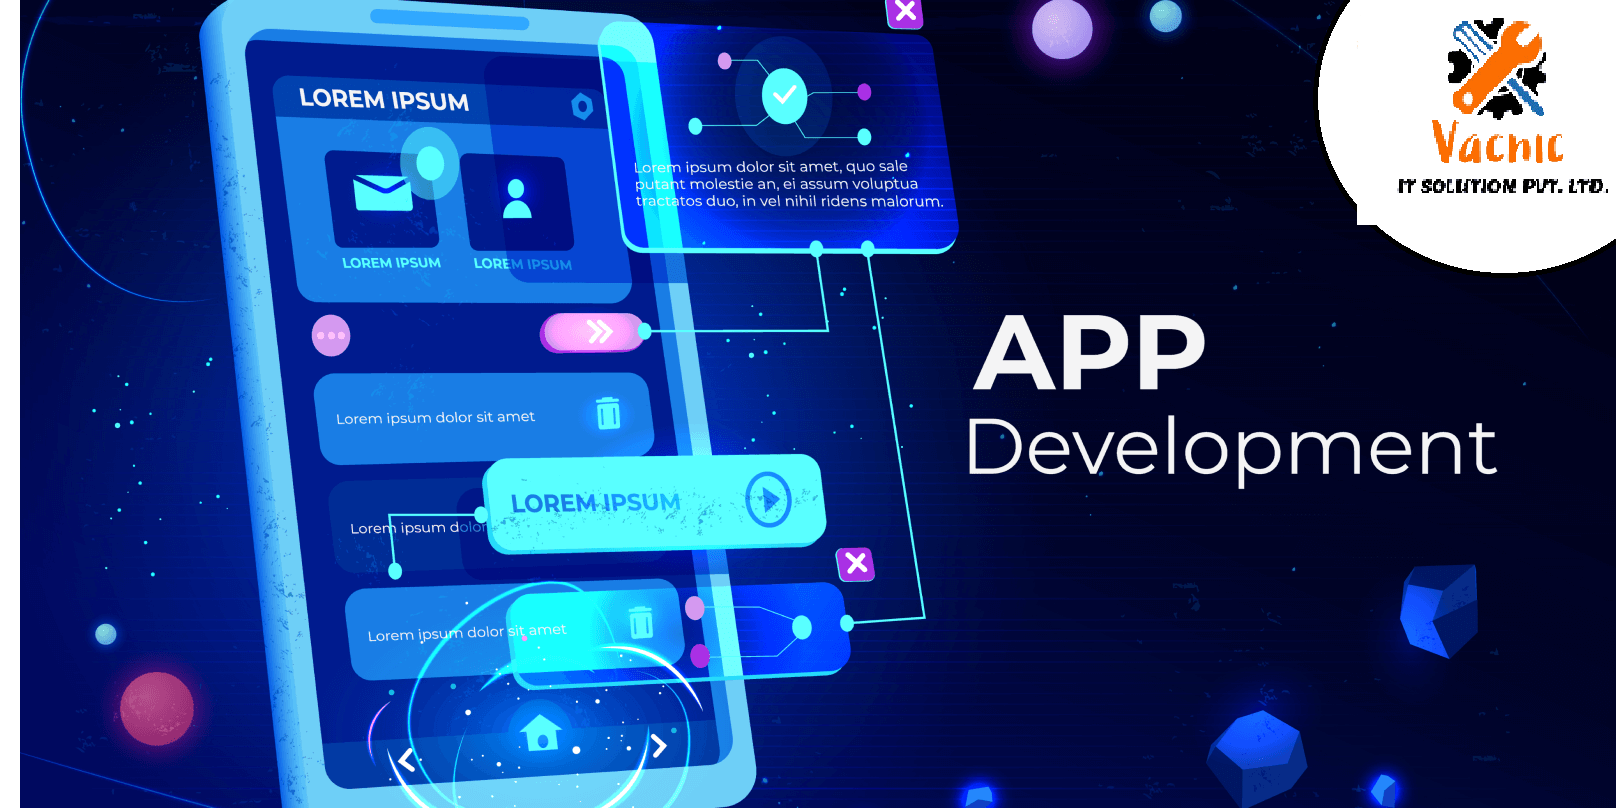 App Development Services in India